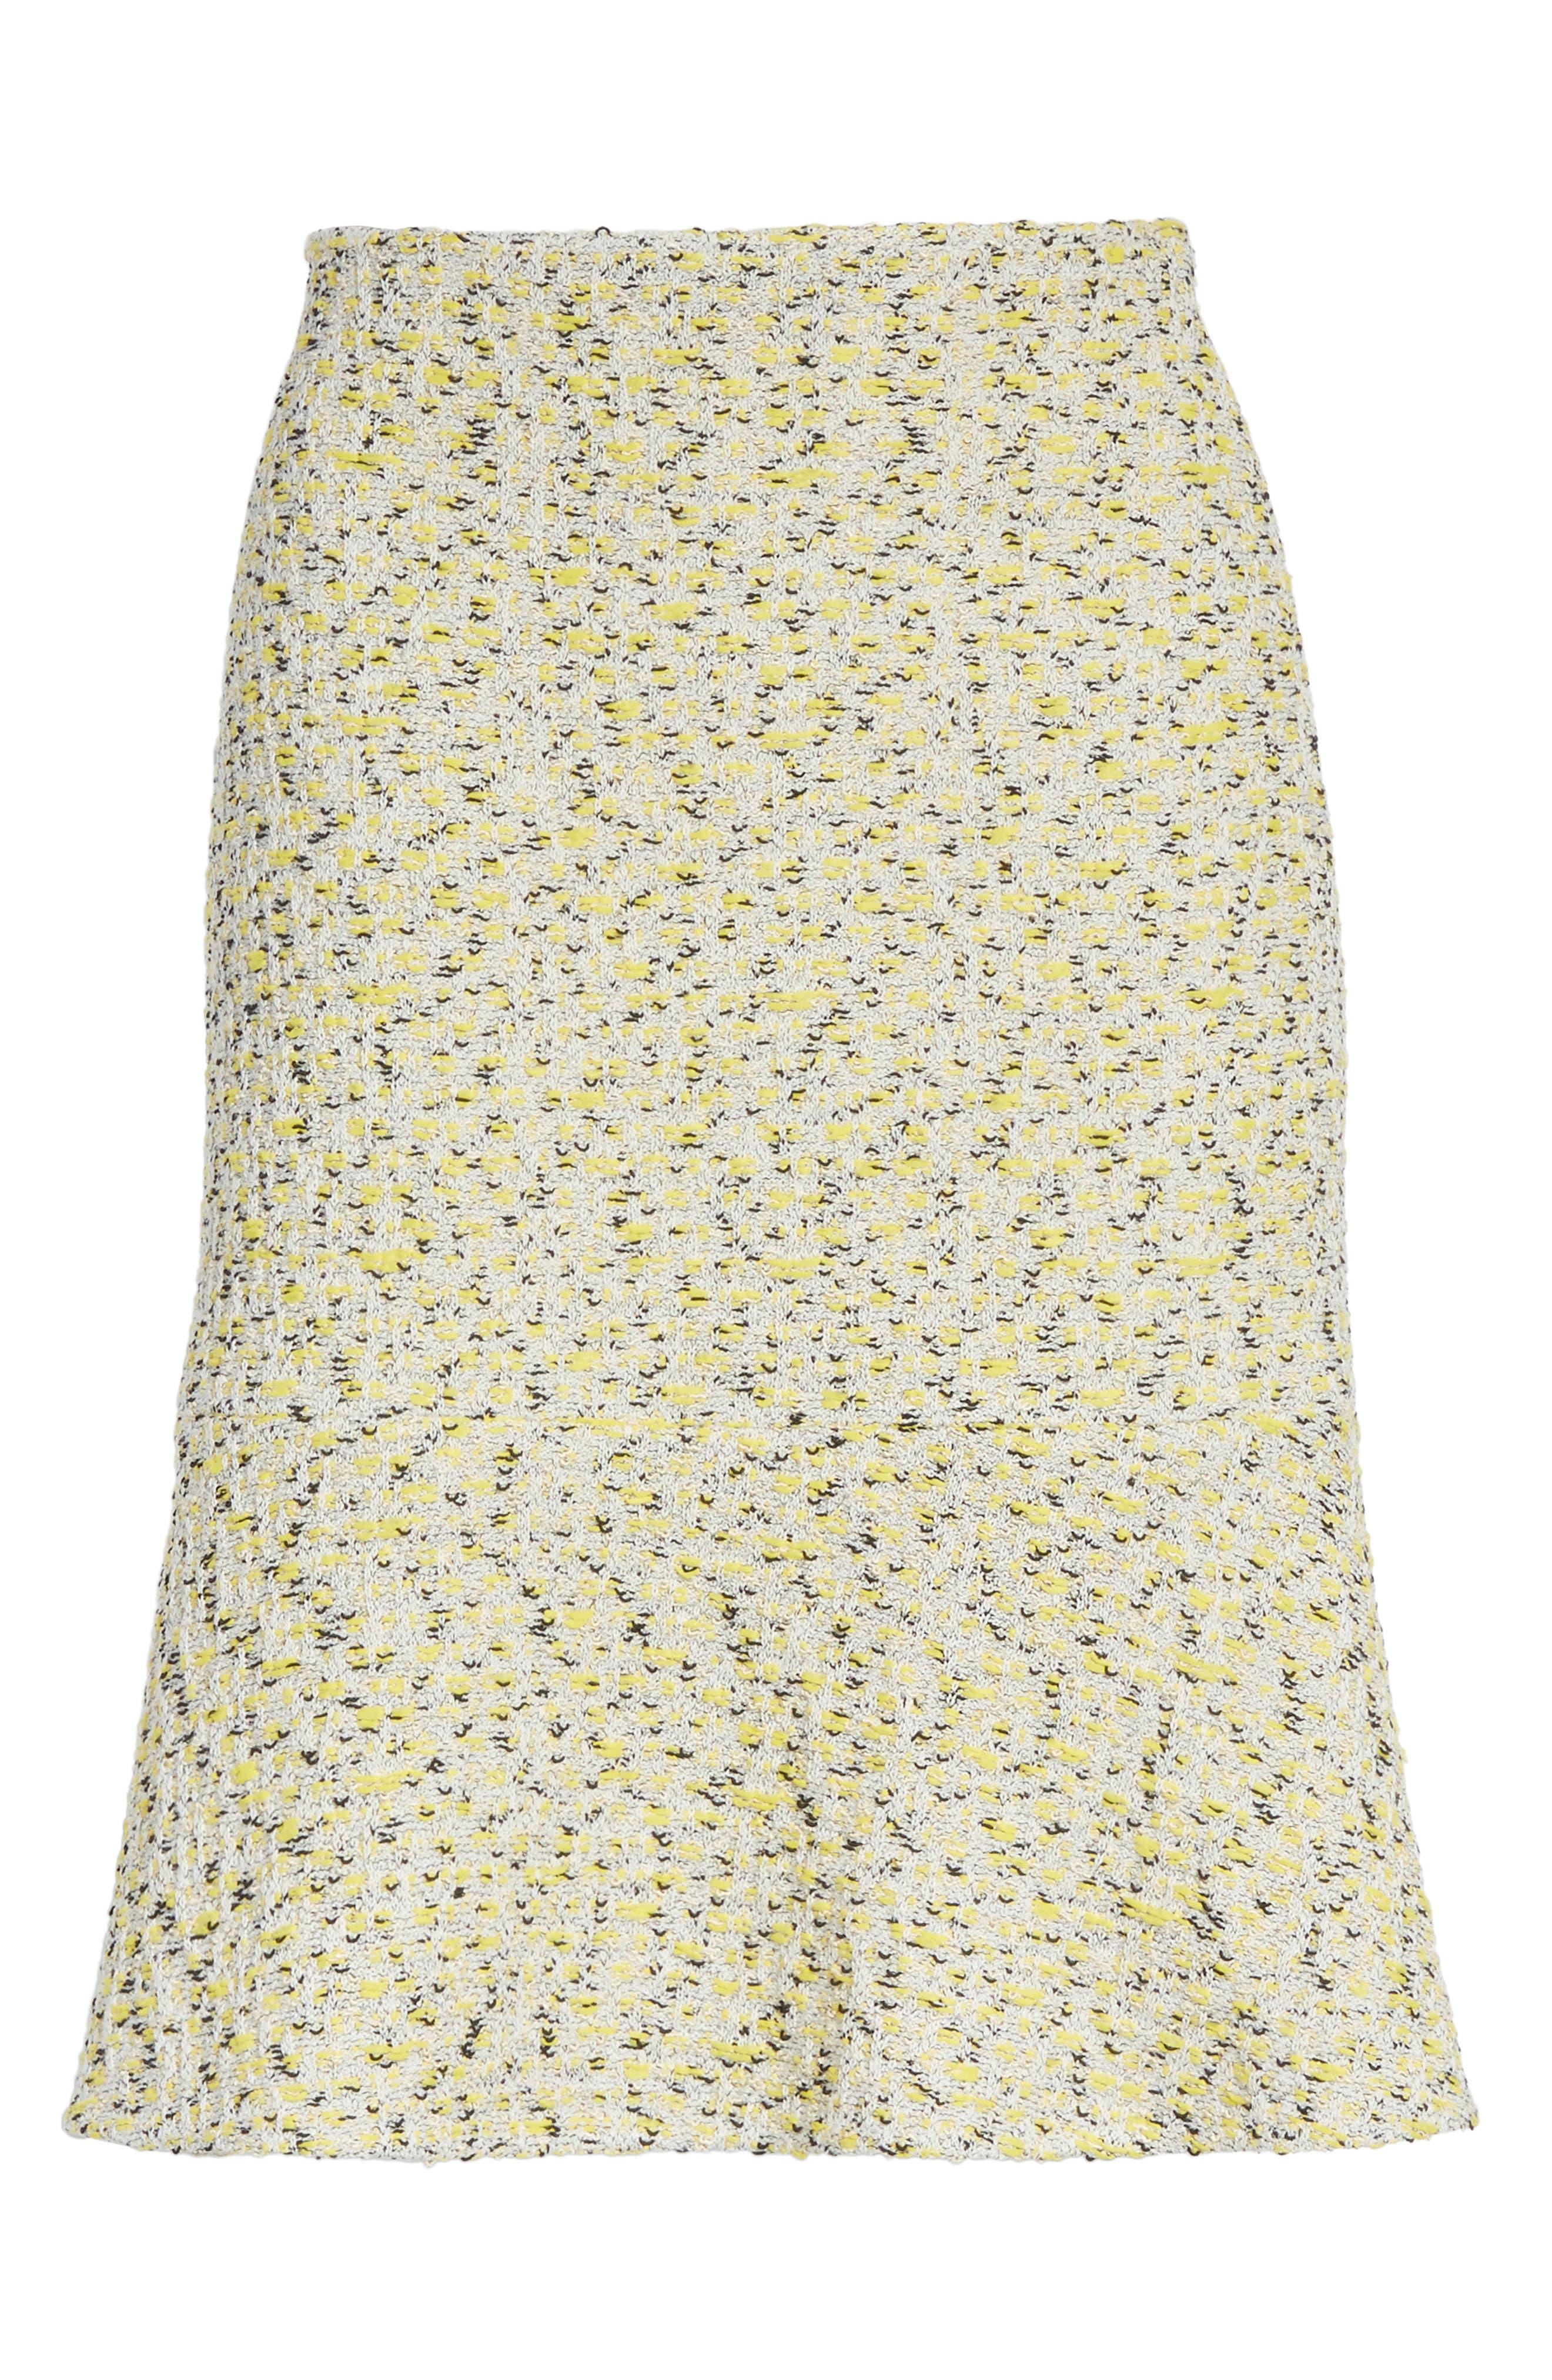 Romee Tweed Fit & Flare Skirt,                             Alternate thumbnail 6, color,                             730